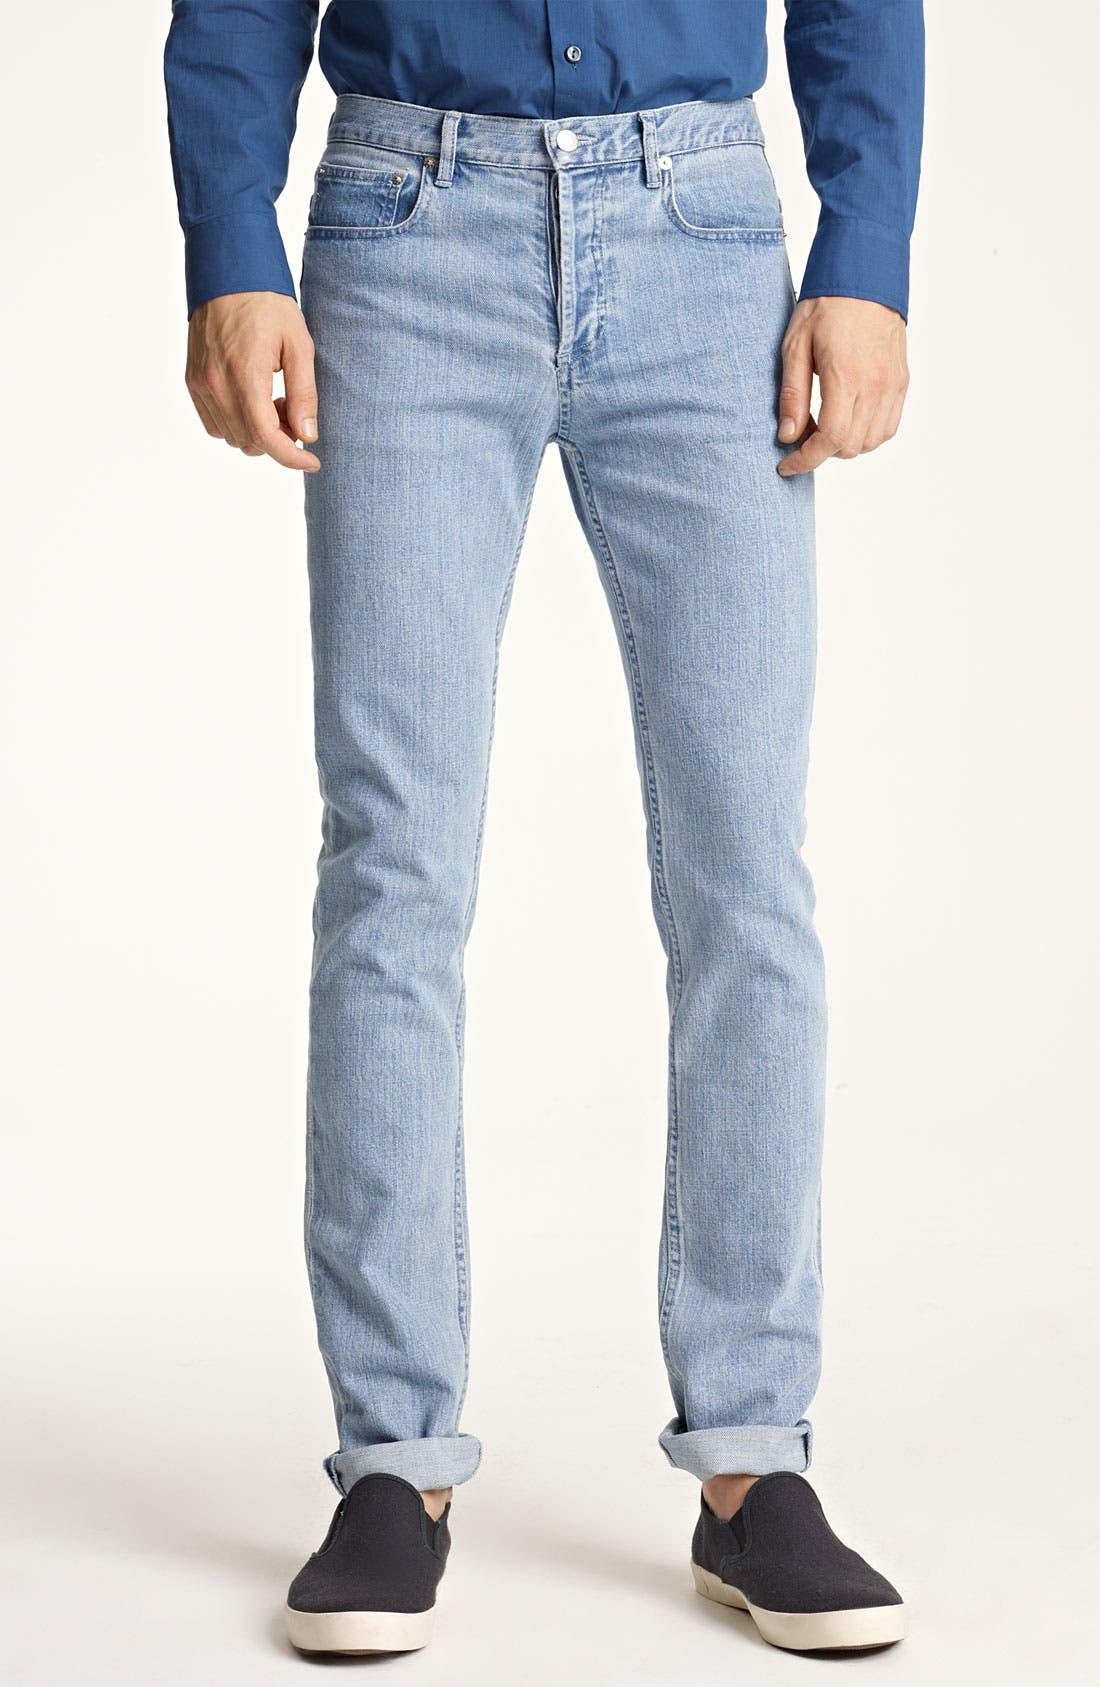 Main Image - A.P.C. 'Petit New Standard' Slim Straight Leg Jeans (Light Blue)